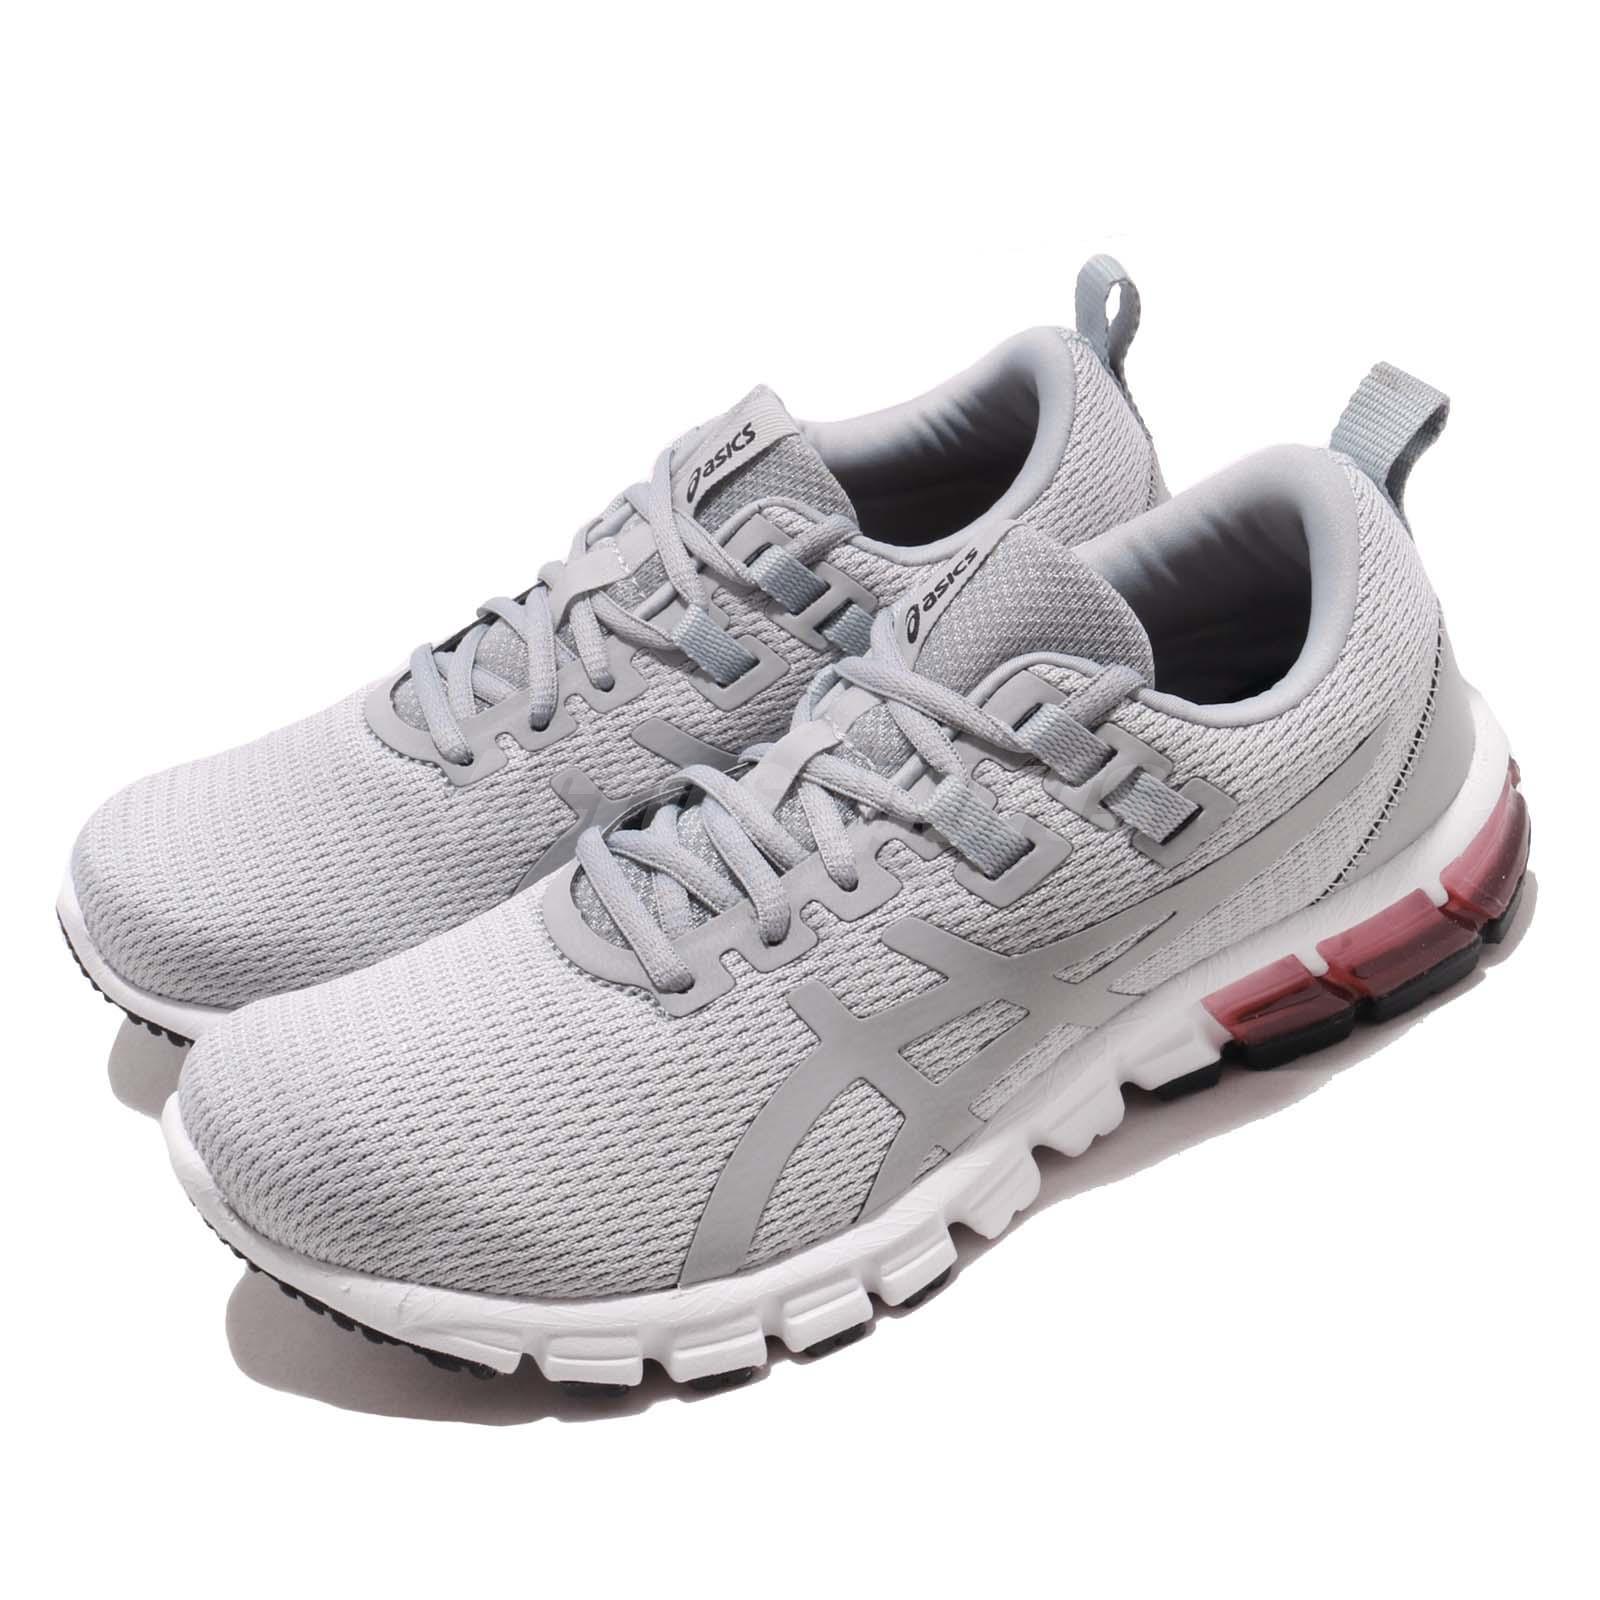 Shoes ASICS Gel Quantum 90 1022A115 Mid GreyMid Grey 020